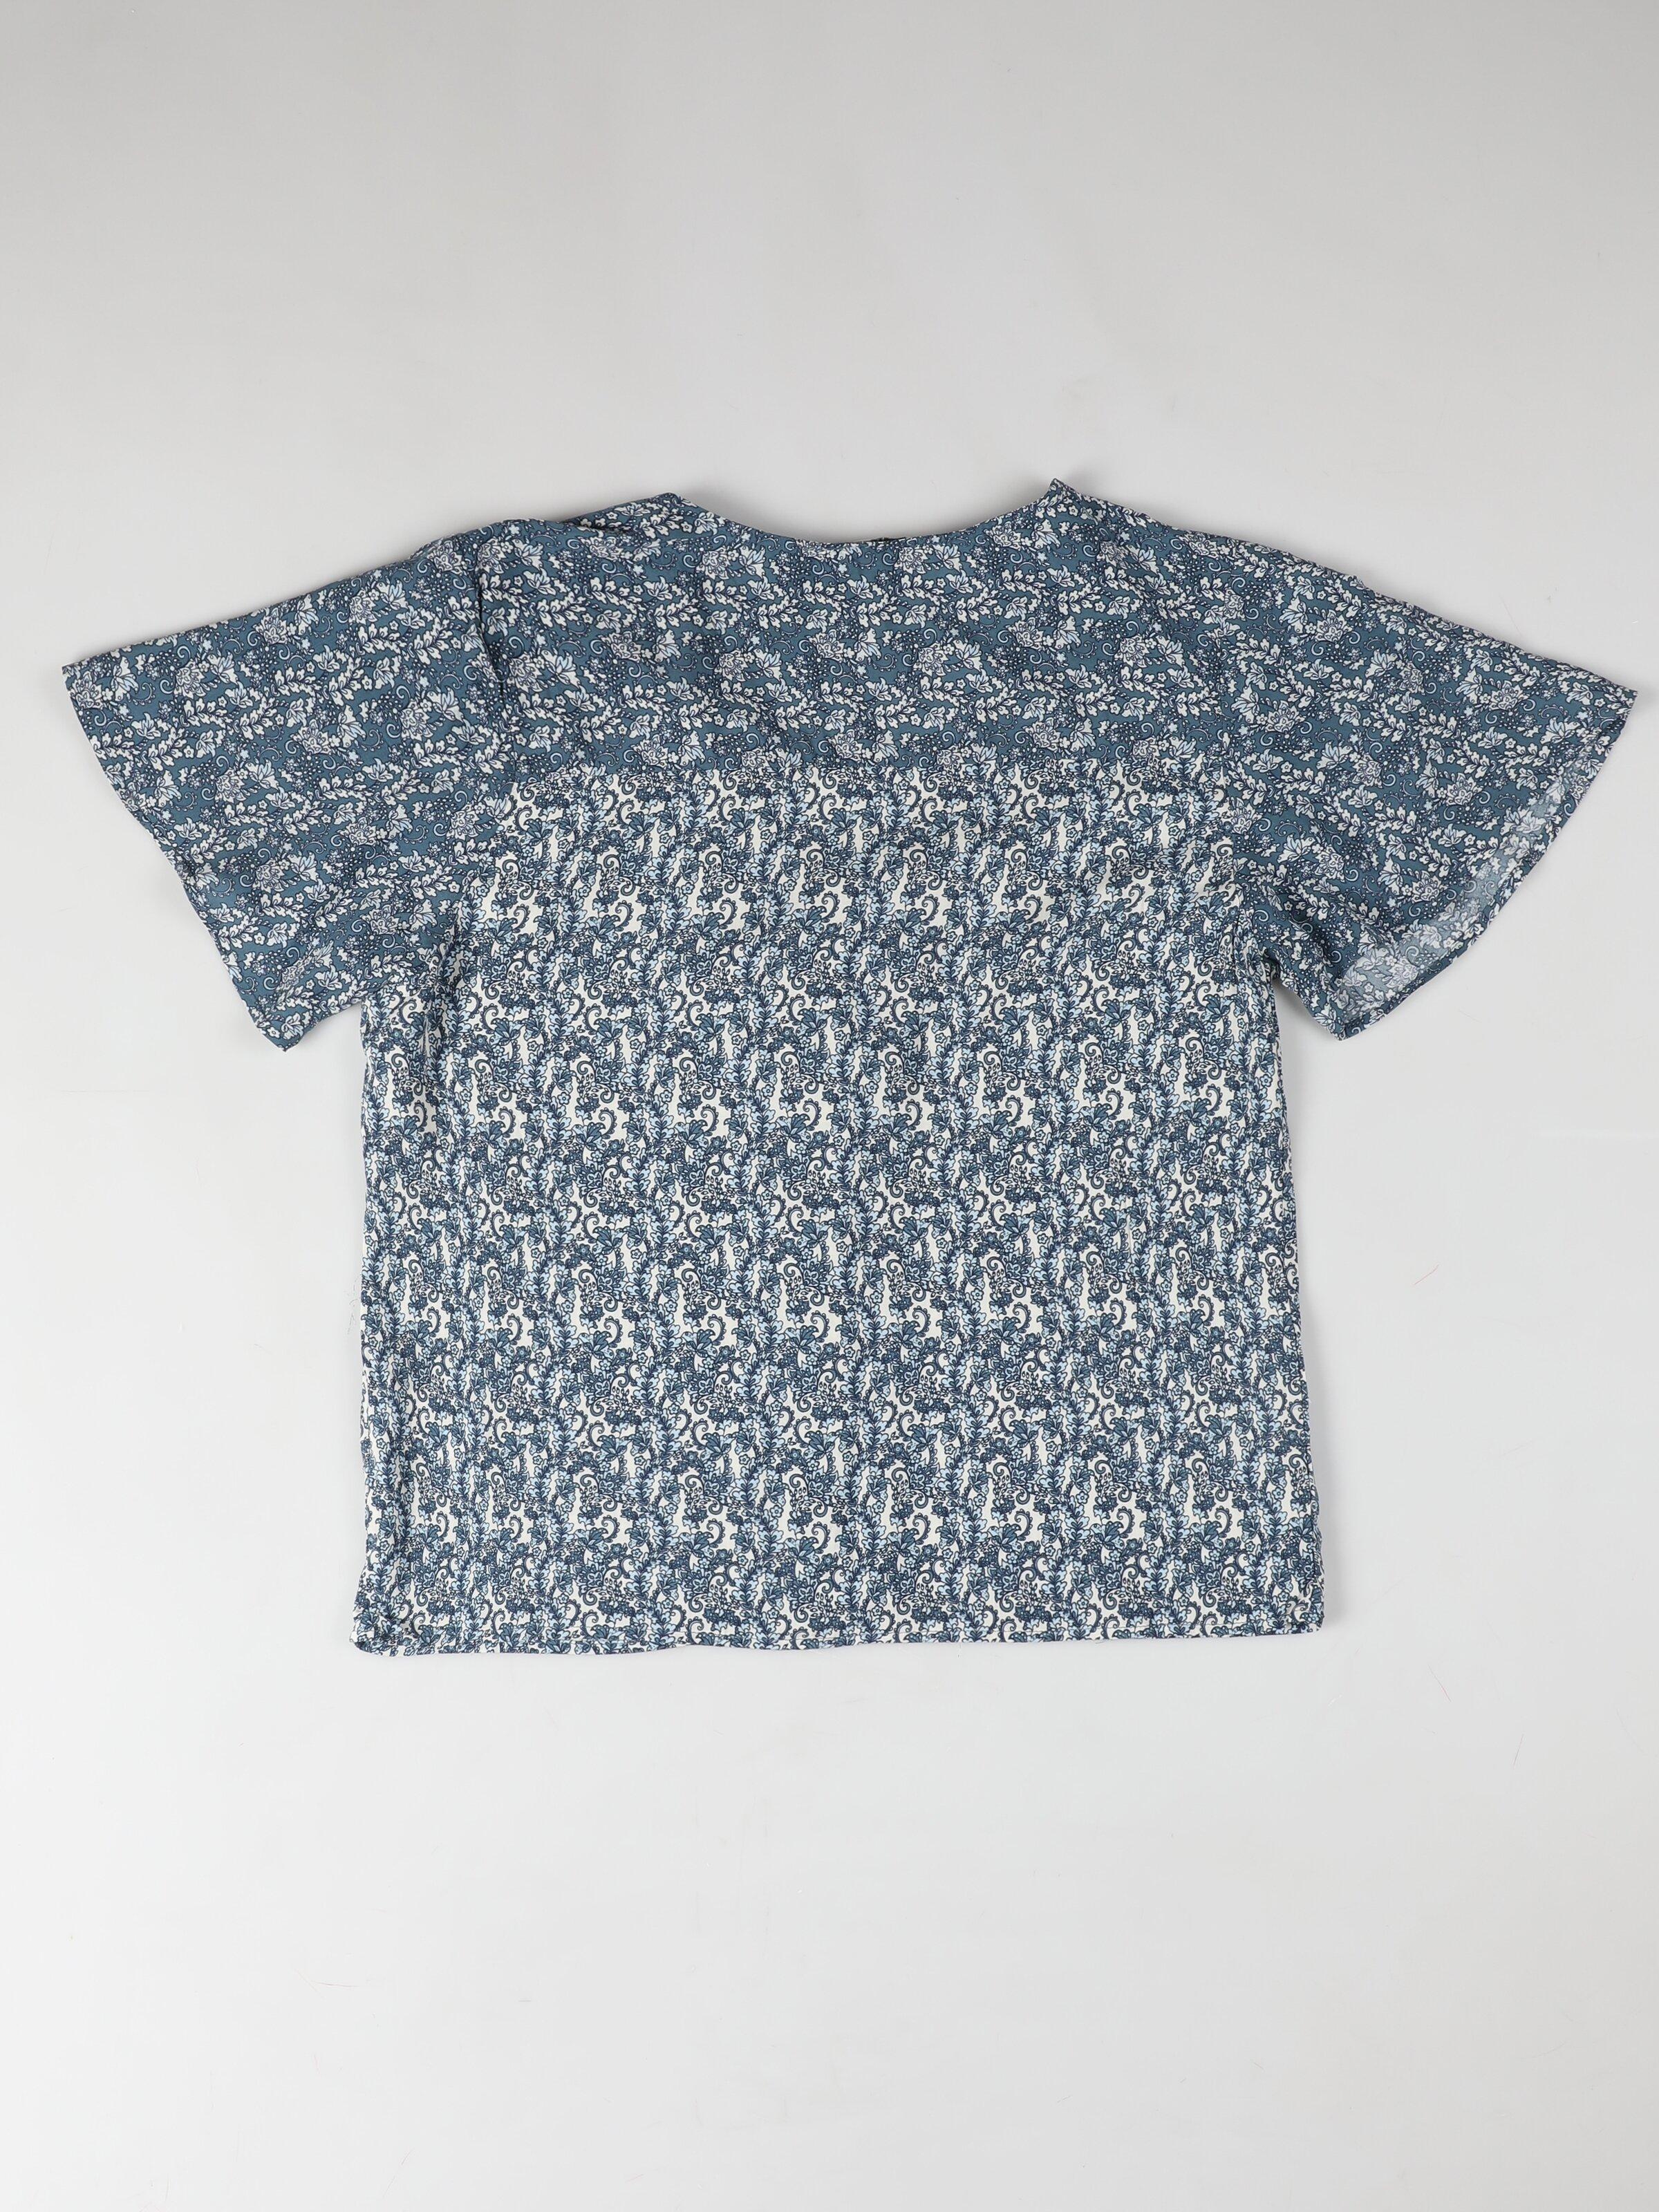 Regular Fit V Yaka Kadın İndigo Kısa Kol Gömlek